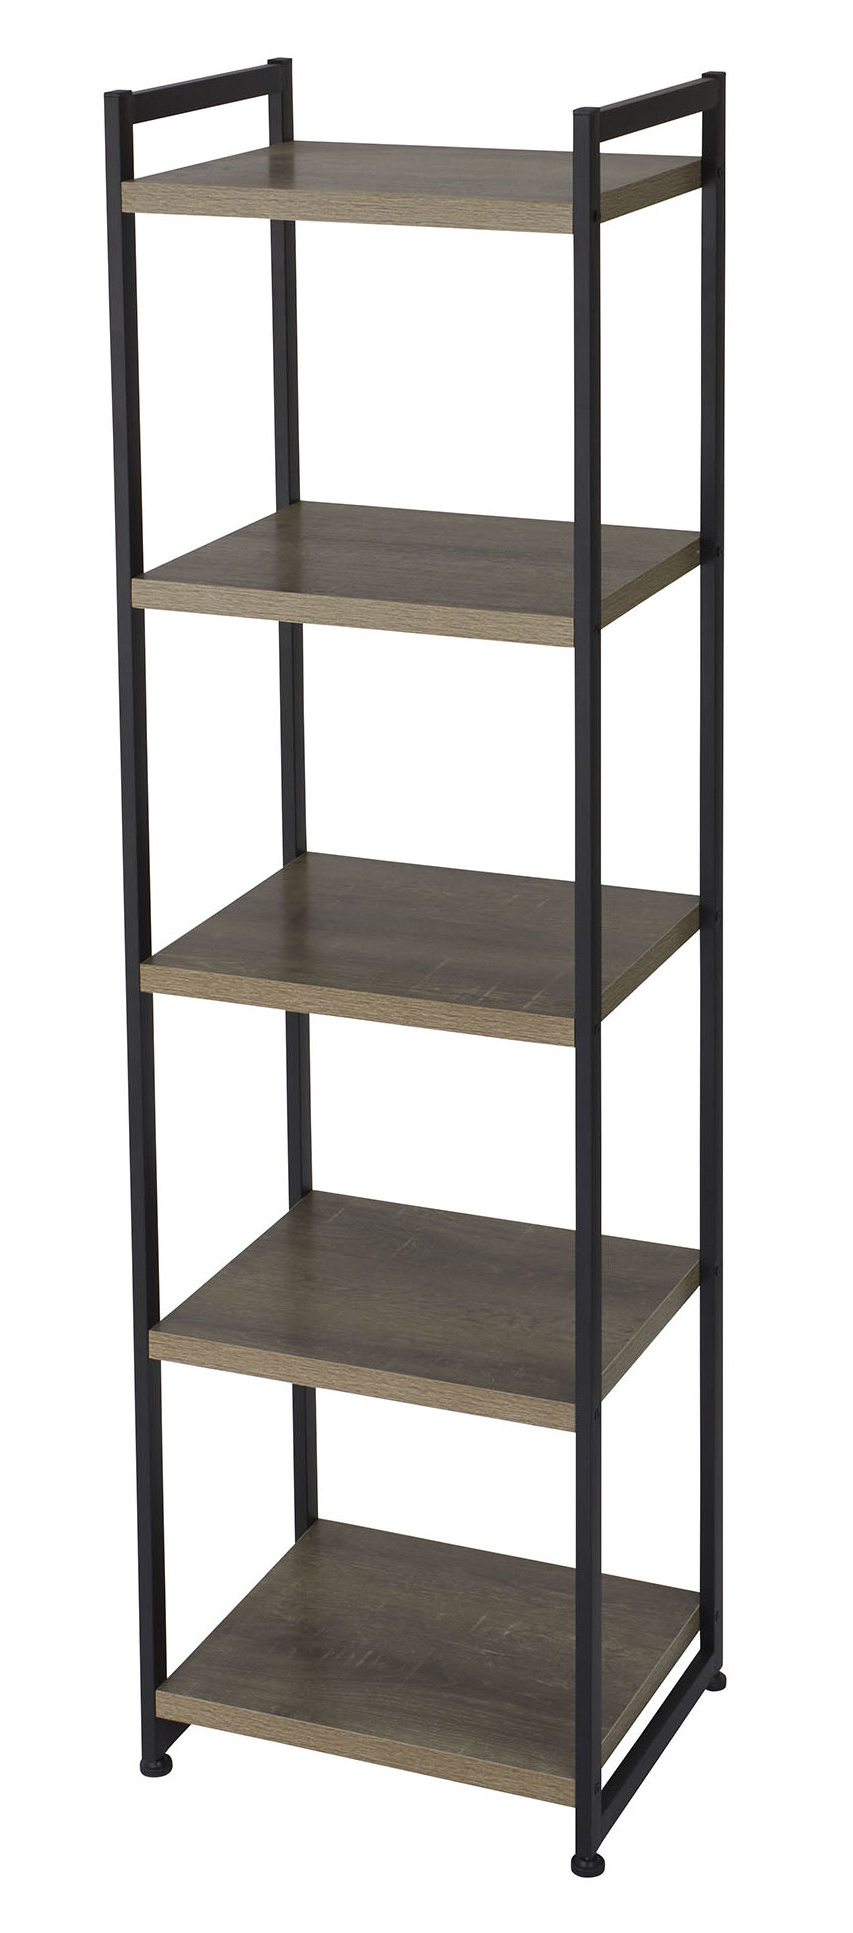 Whipkey Etagere Bookcase Regarding Preferred Whipkey Etagere Bookcases (View 2 of 20)